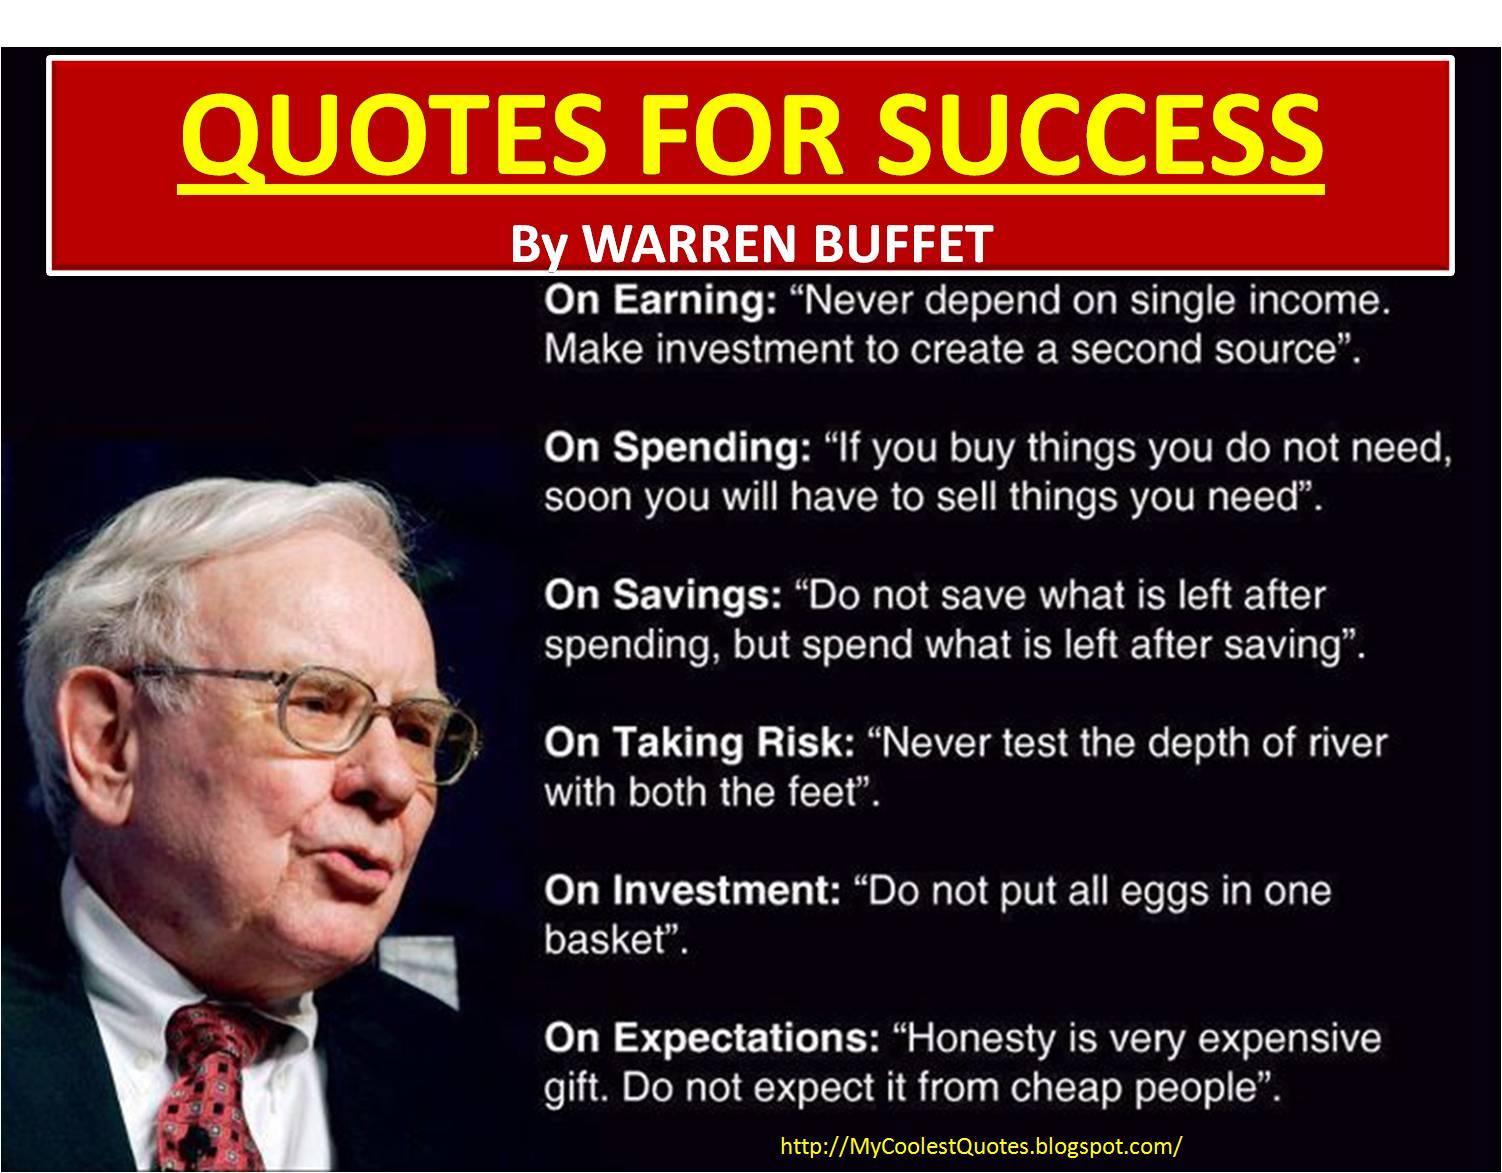 Savings quote #3